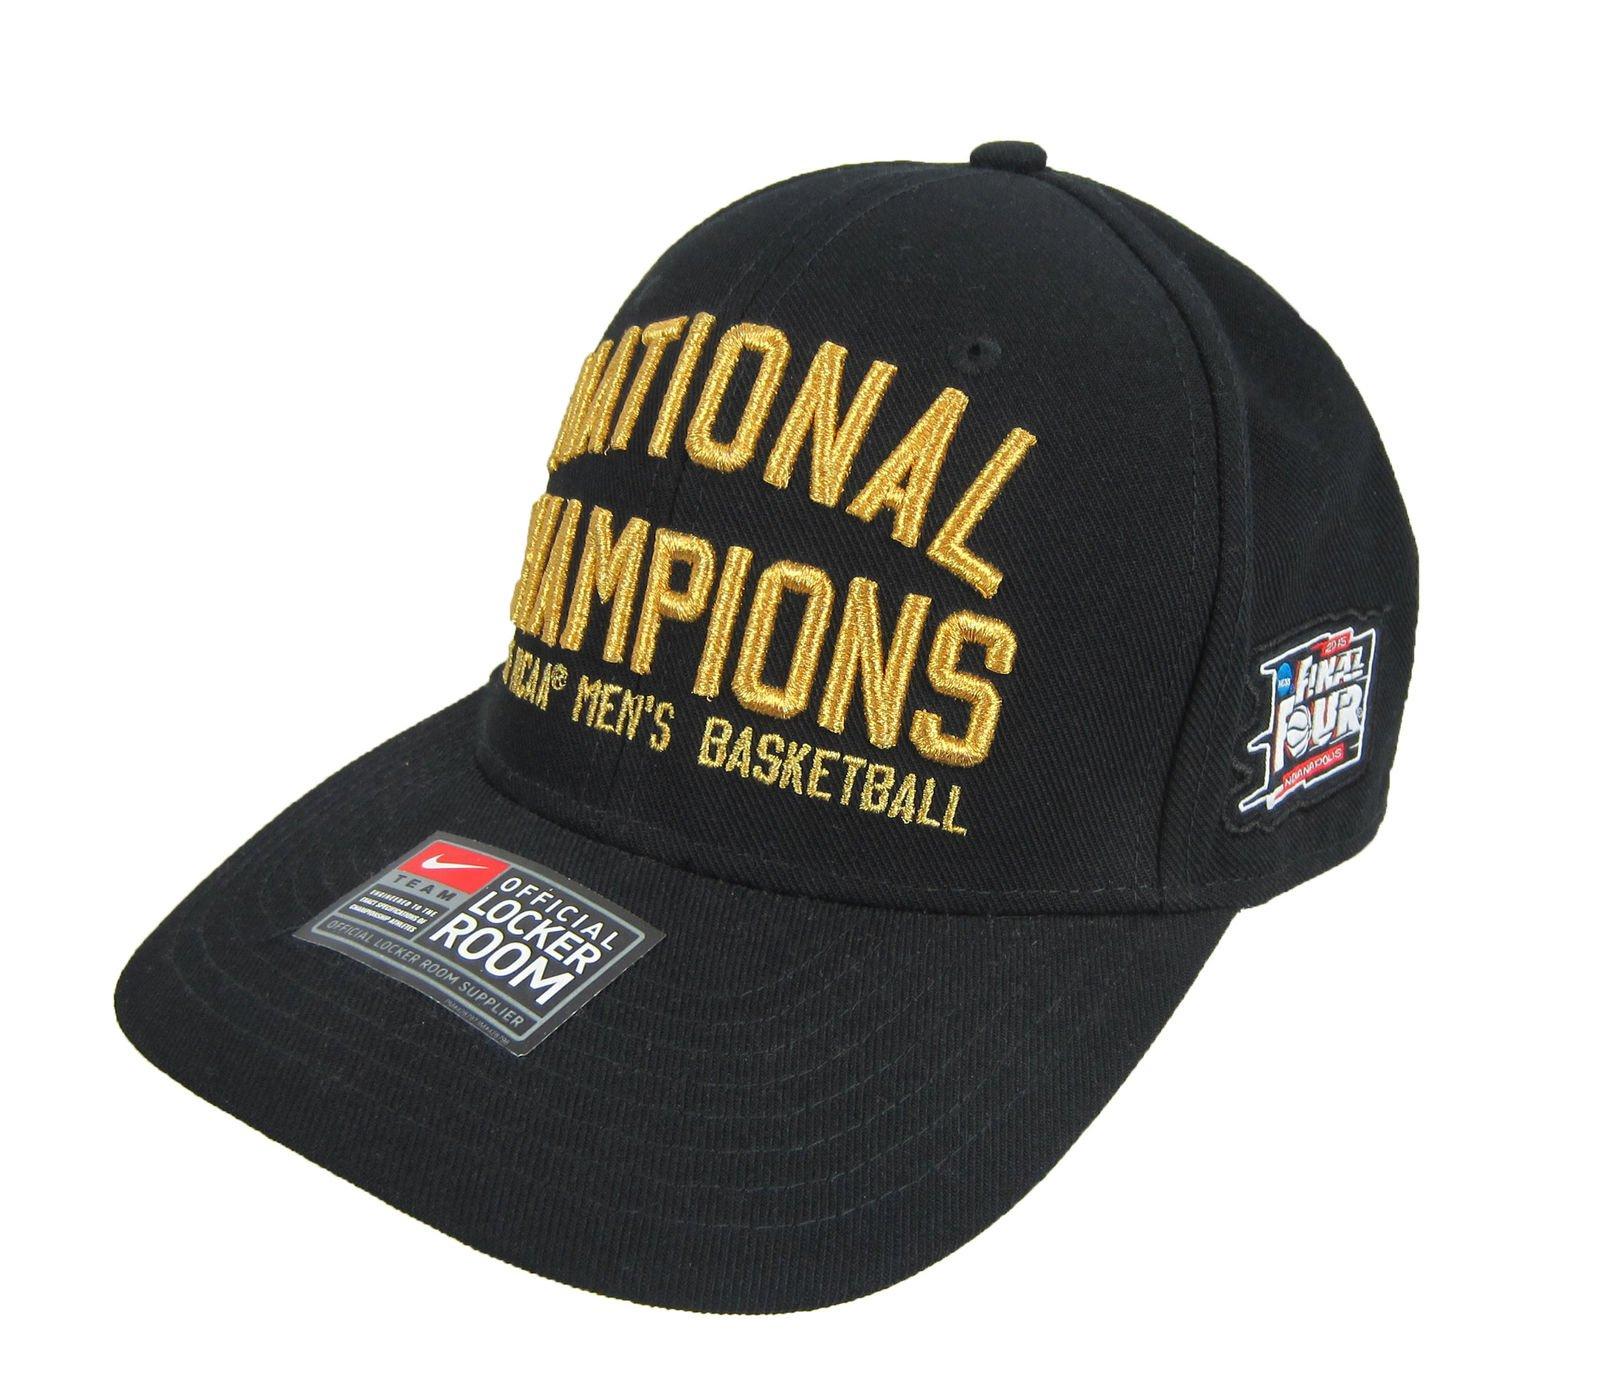 Nike Duke National Champions 2015 NCAA Men s Basketball Hat Black Gold  Snapback eddb58033c5